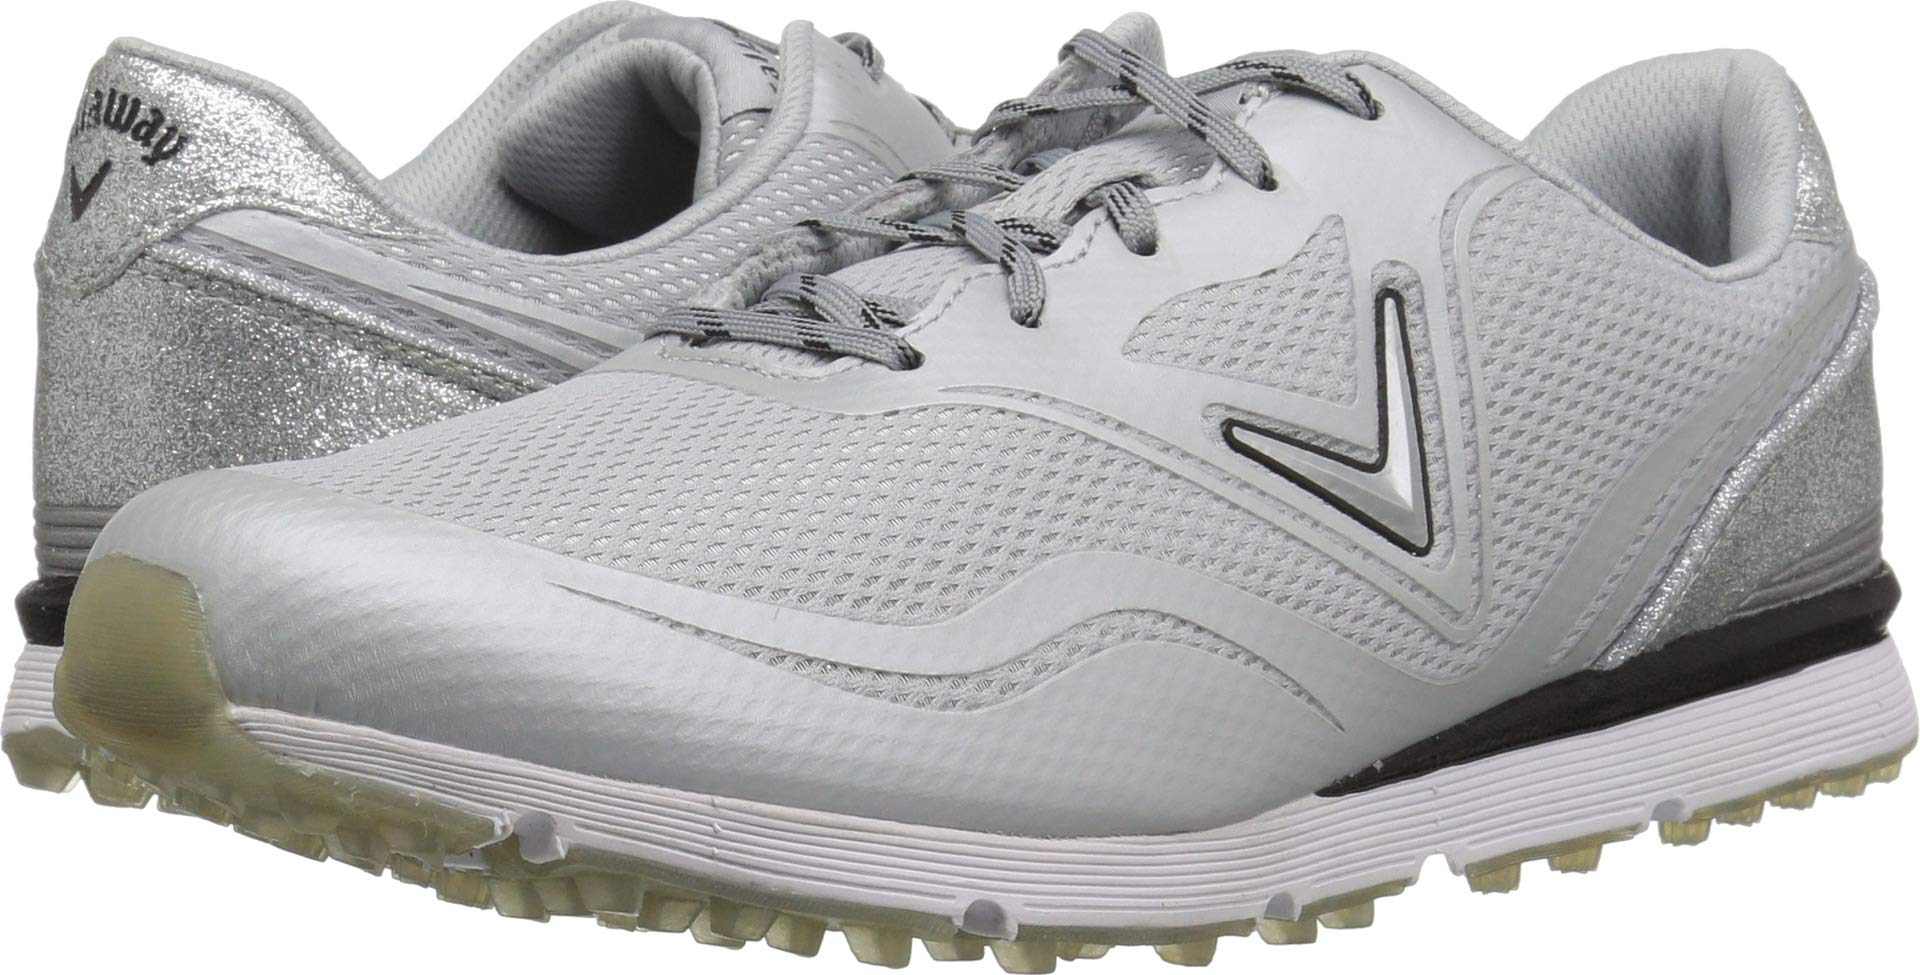 Callaway Women's Solaire Golf Shoe, Light Grey, 7 B B US